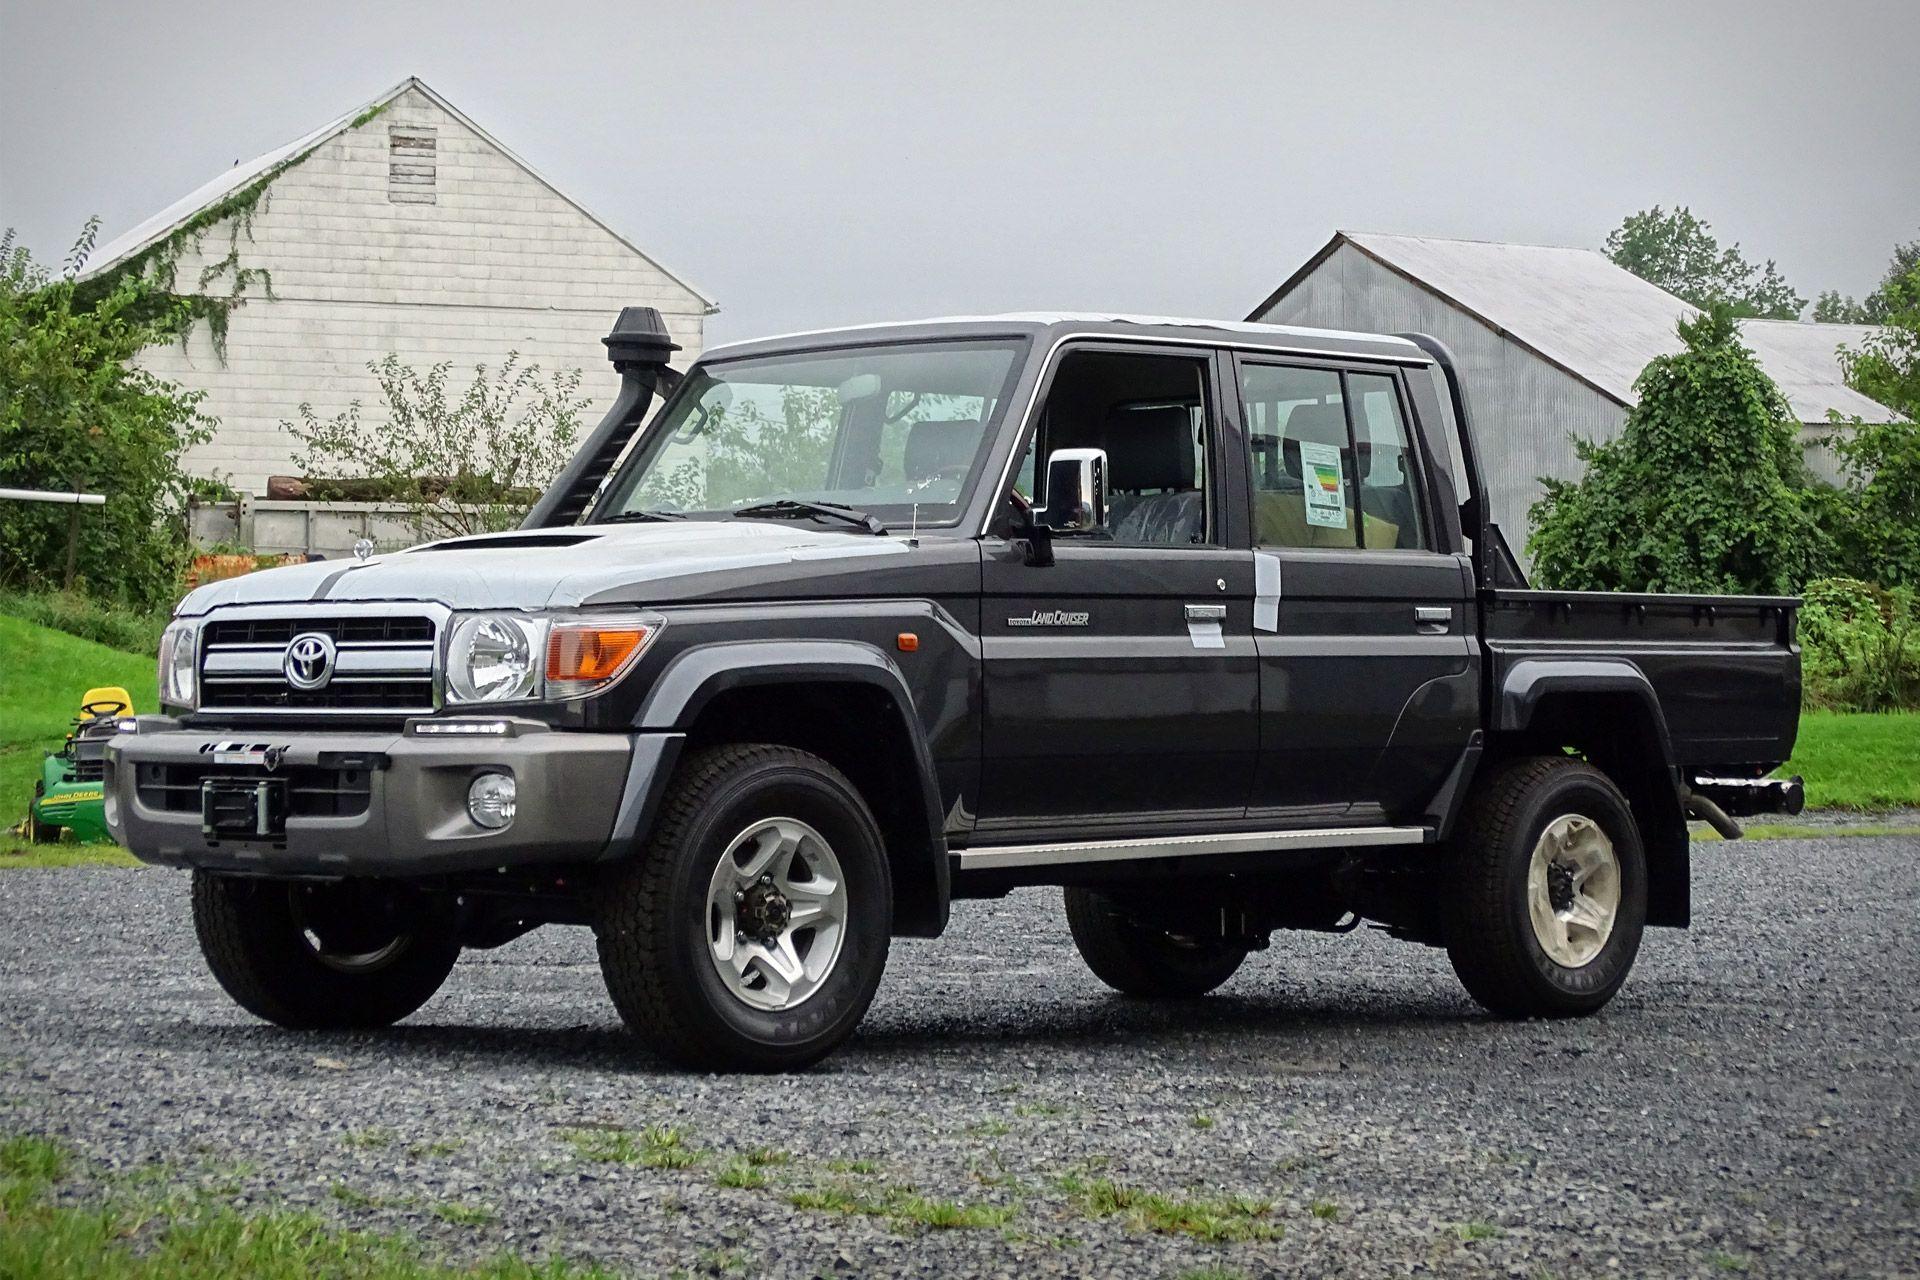 Toyota Diesel Truck >> Lc America Toyota Land Cruiser Diesel Truck Cars Toyota Land